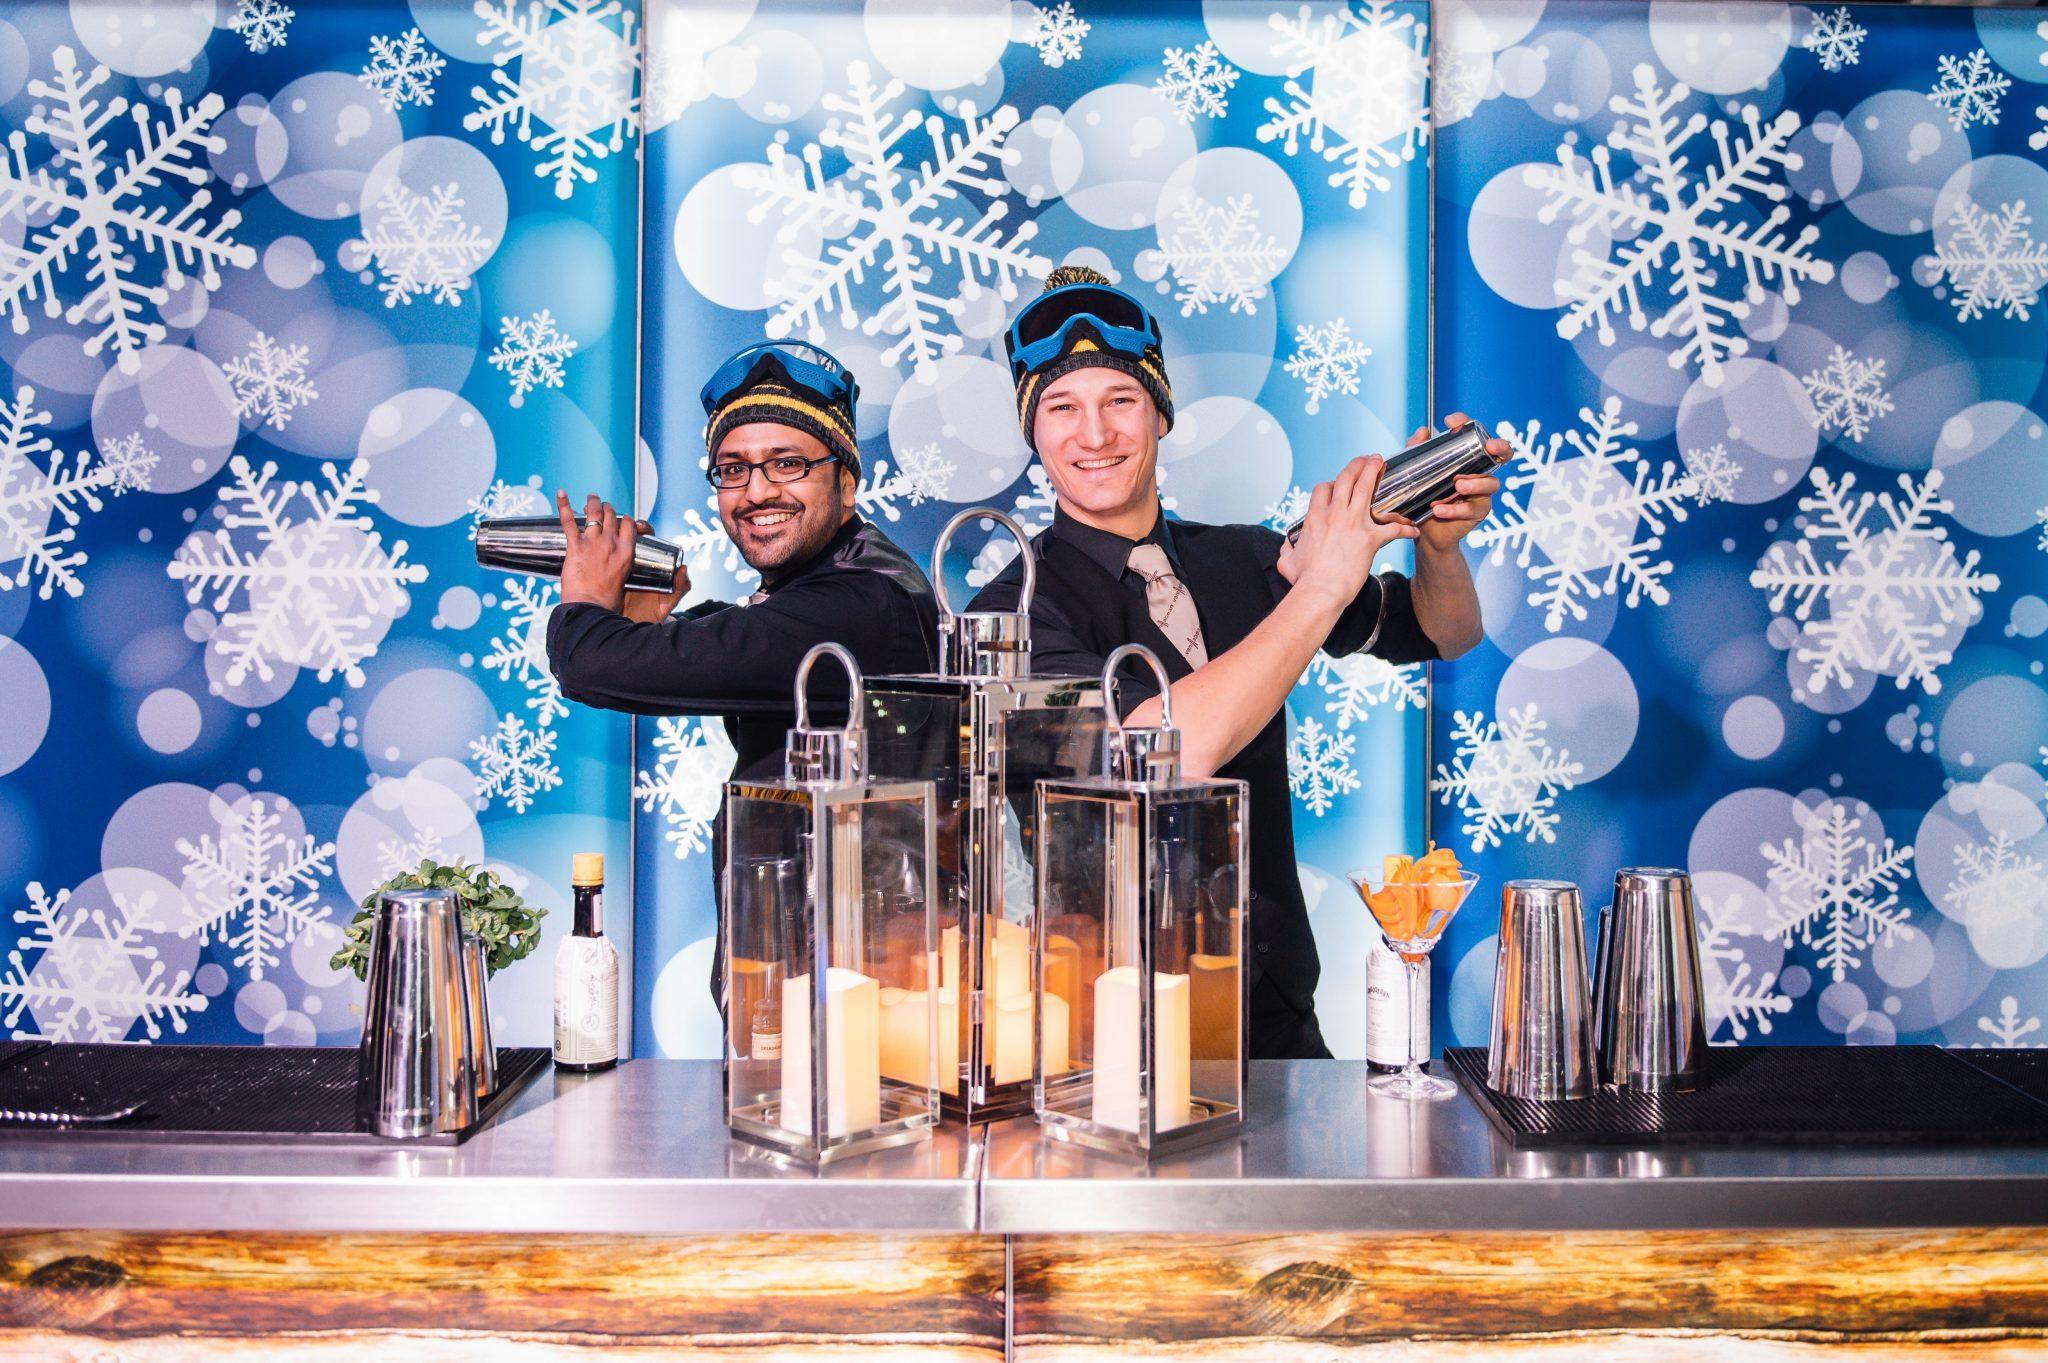 alpine chic mobile bar hire